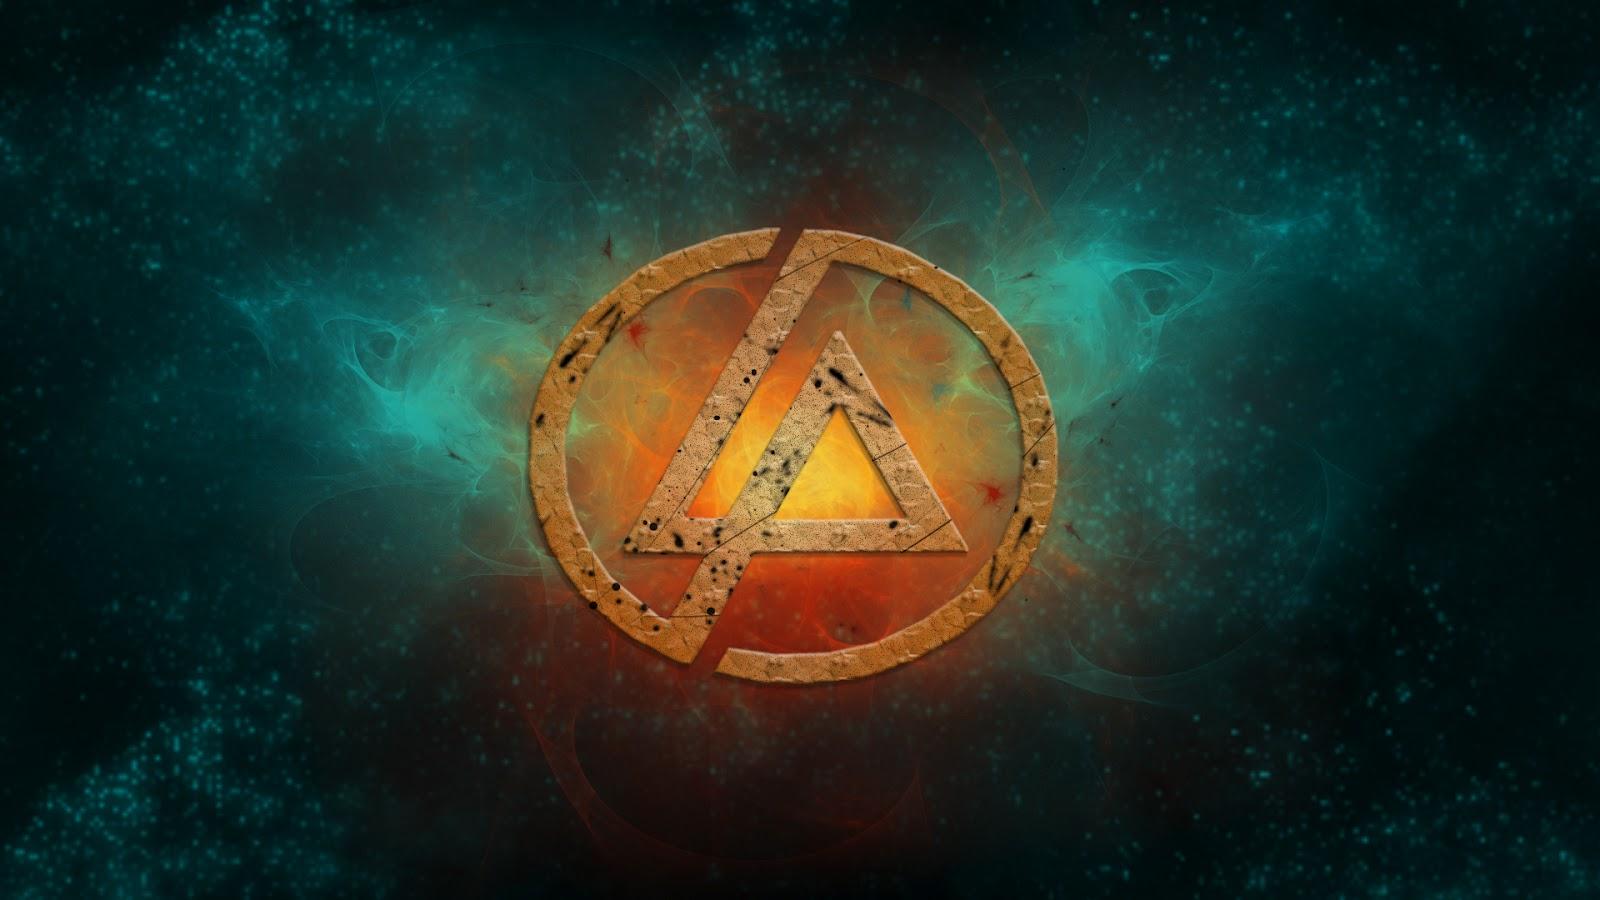 Killzone Shadow Fall Wallpaper 1080p Wallpapers Hd Linkin Park Banda De Rock Wallpapers De La